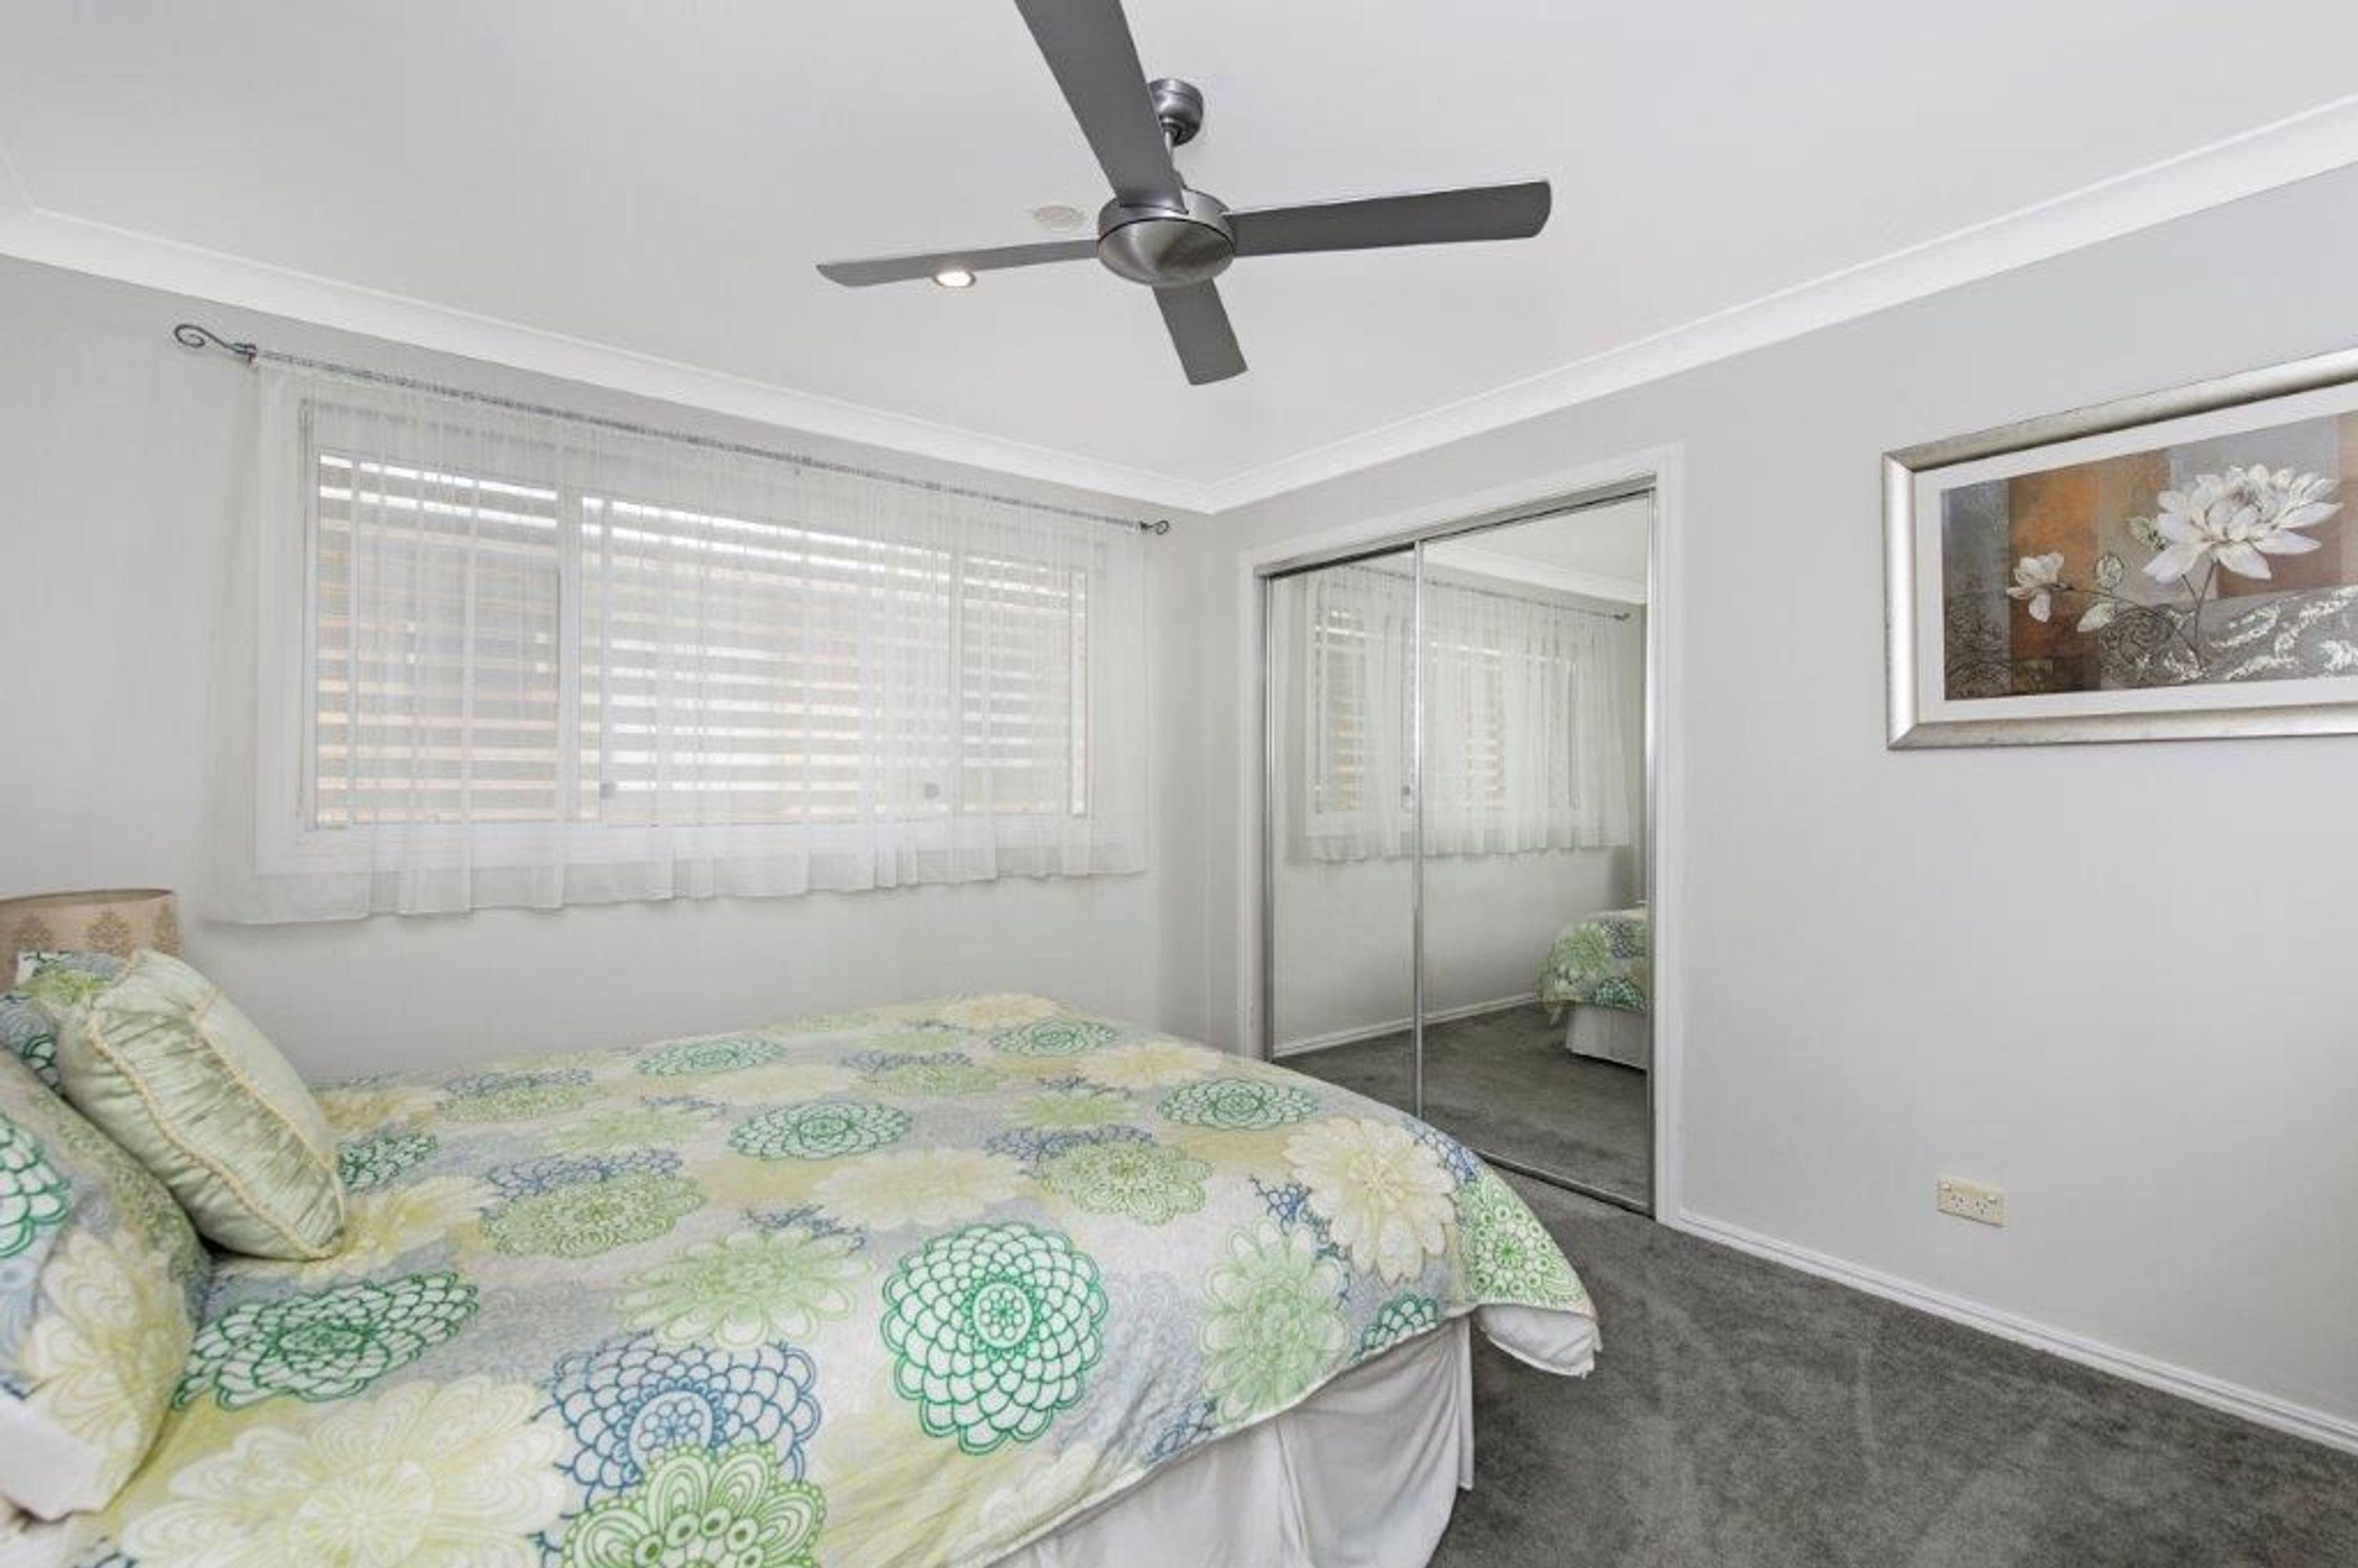 2/37 Breaker Street, Main Beach, QLD 4217